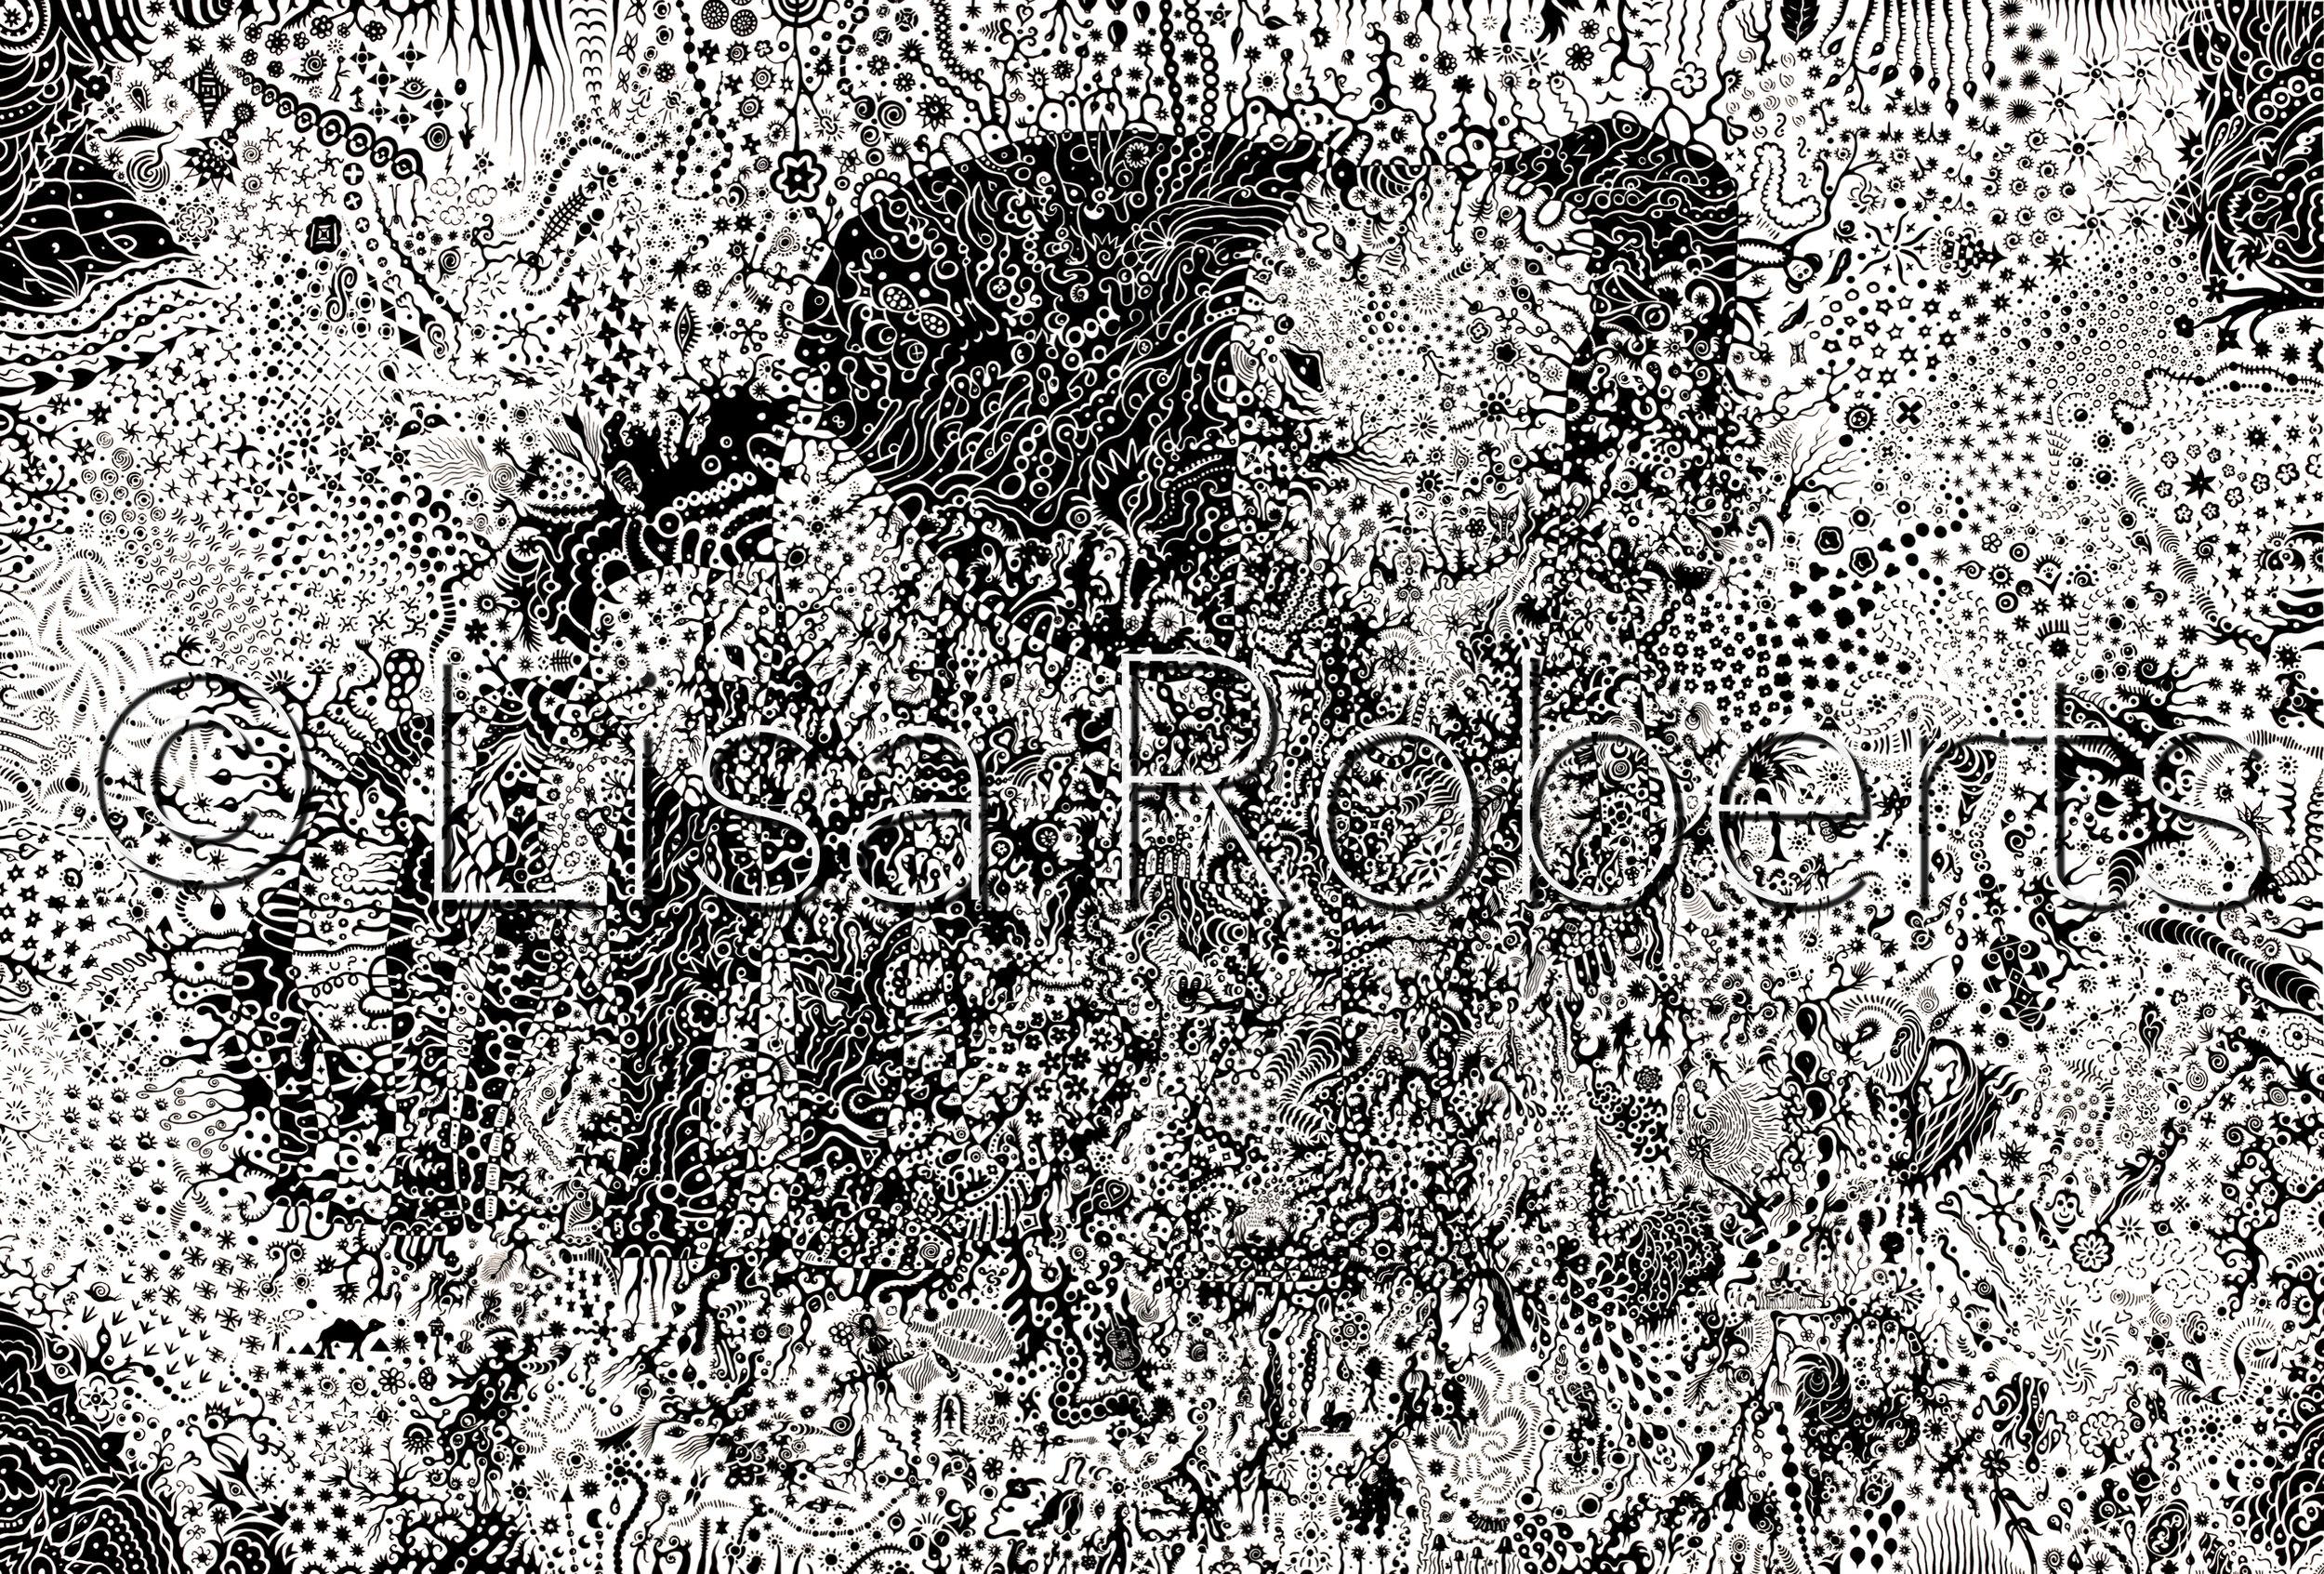 Original Size approx.841 x 594 mm (A1)